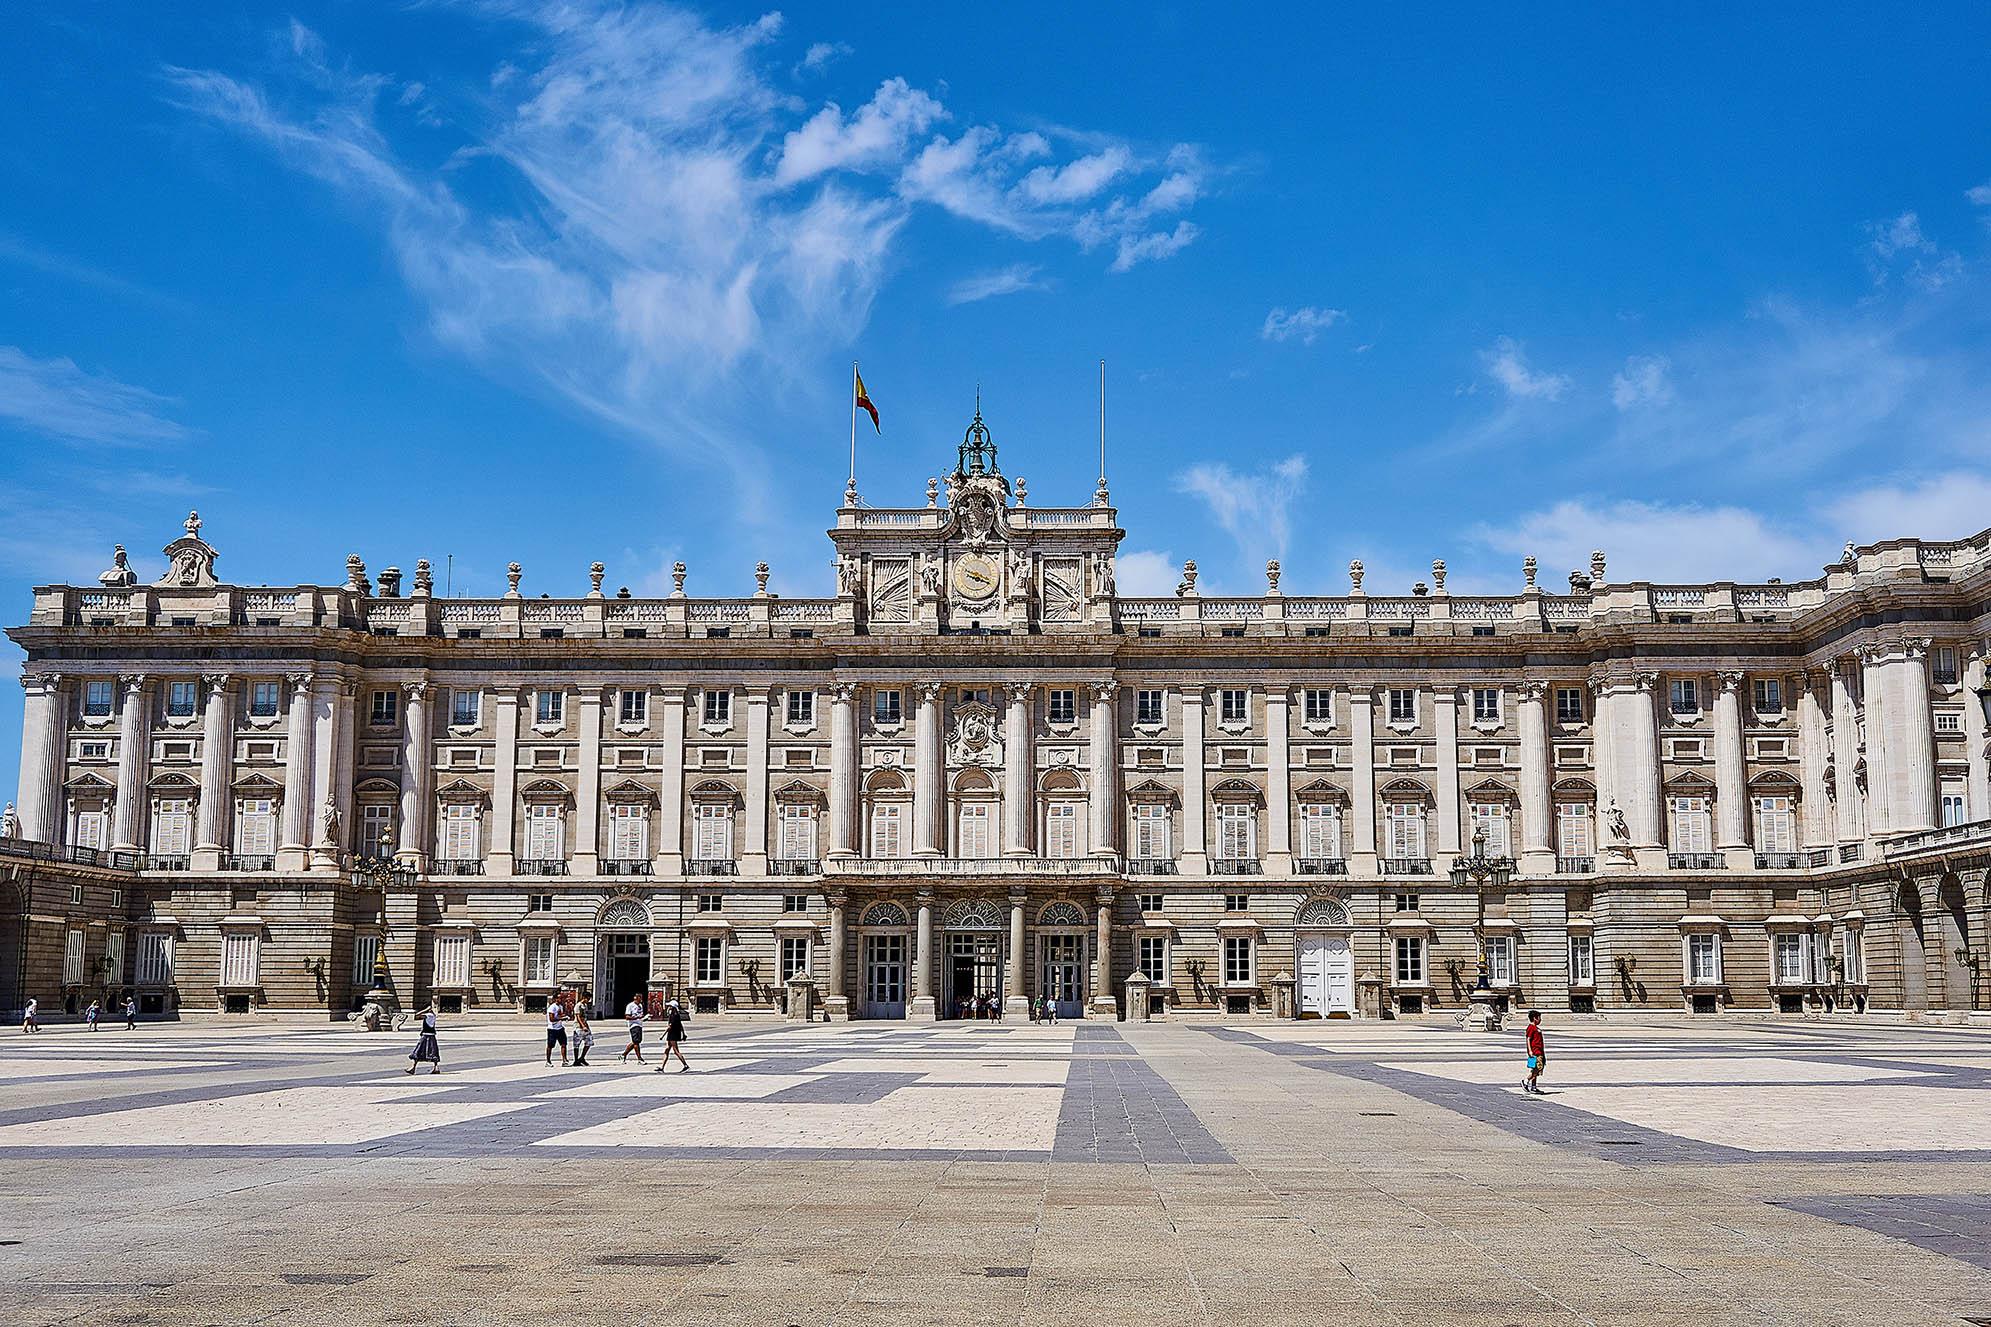 Palacio Real i Madrid. Huvudstäder.